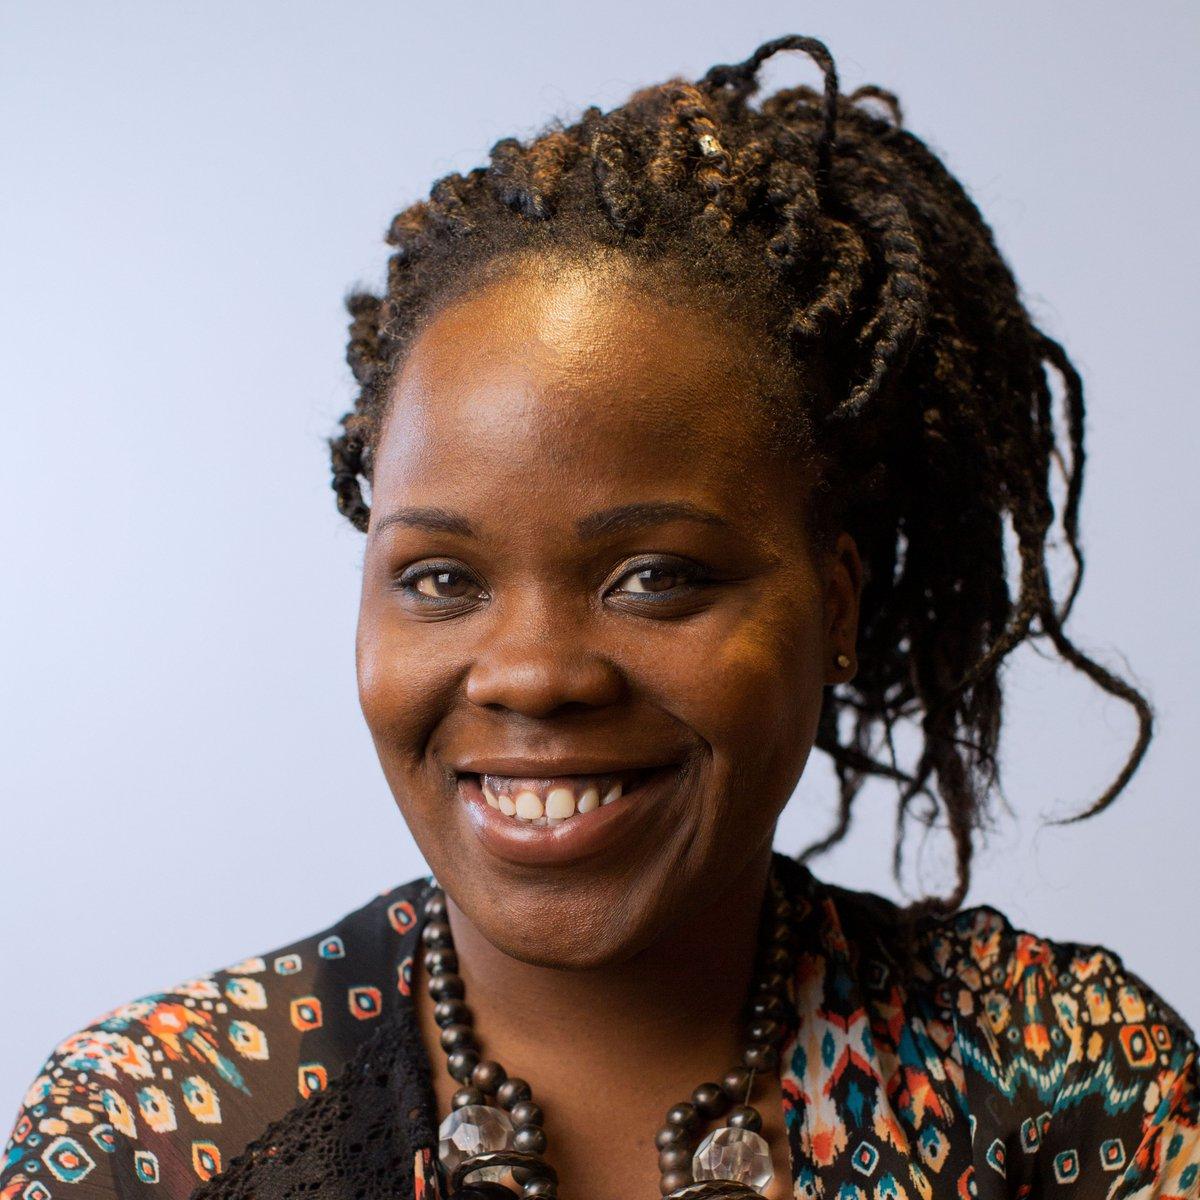 ebook women crossing boundaries a psychology